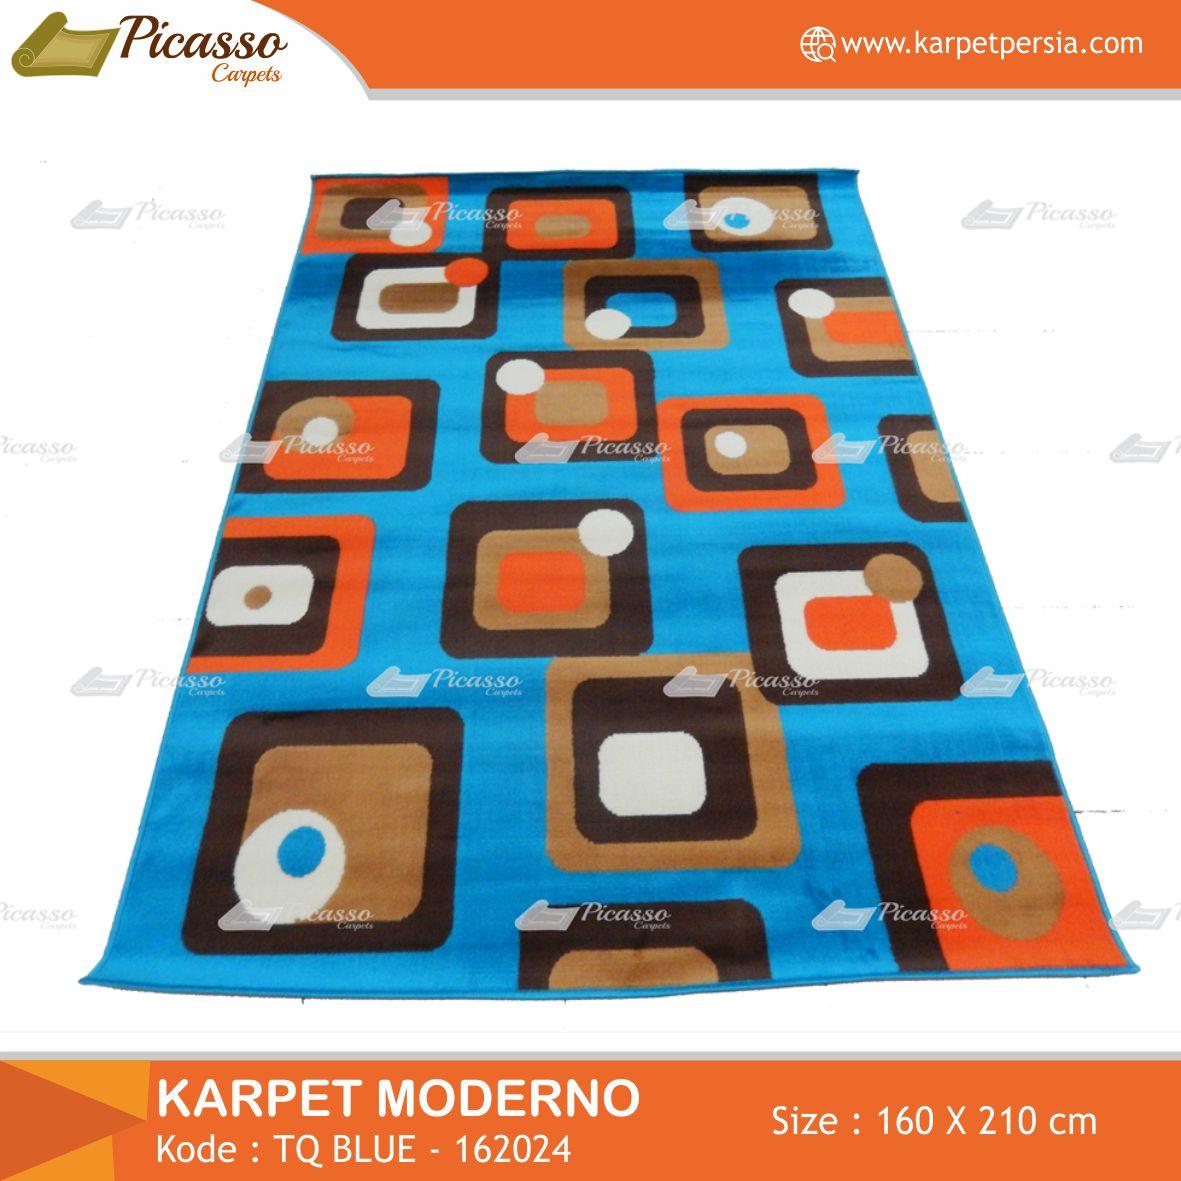 Harga Jual Karpet Pp 190x260 1 Termurah 2018 Kerupuk Ikan By Sumber Rezeki Akumandiri Moderno 190 X 260 Picasso Rugs Carpets